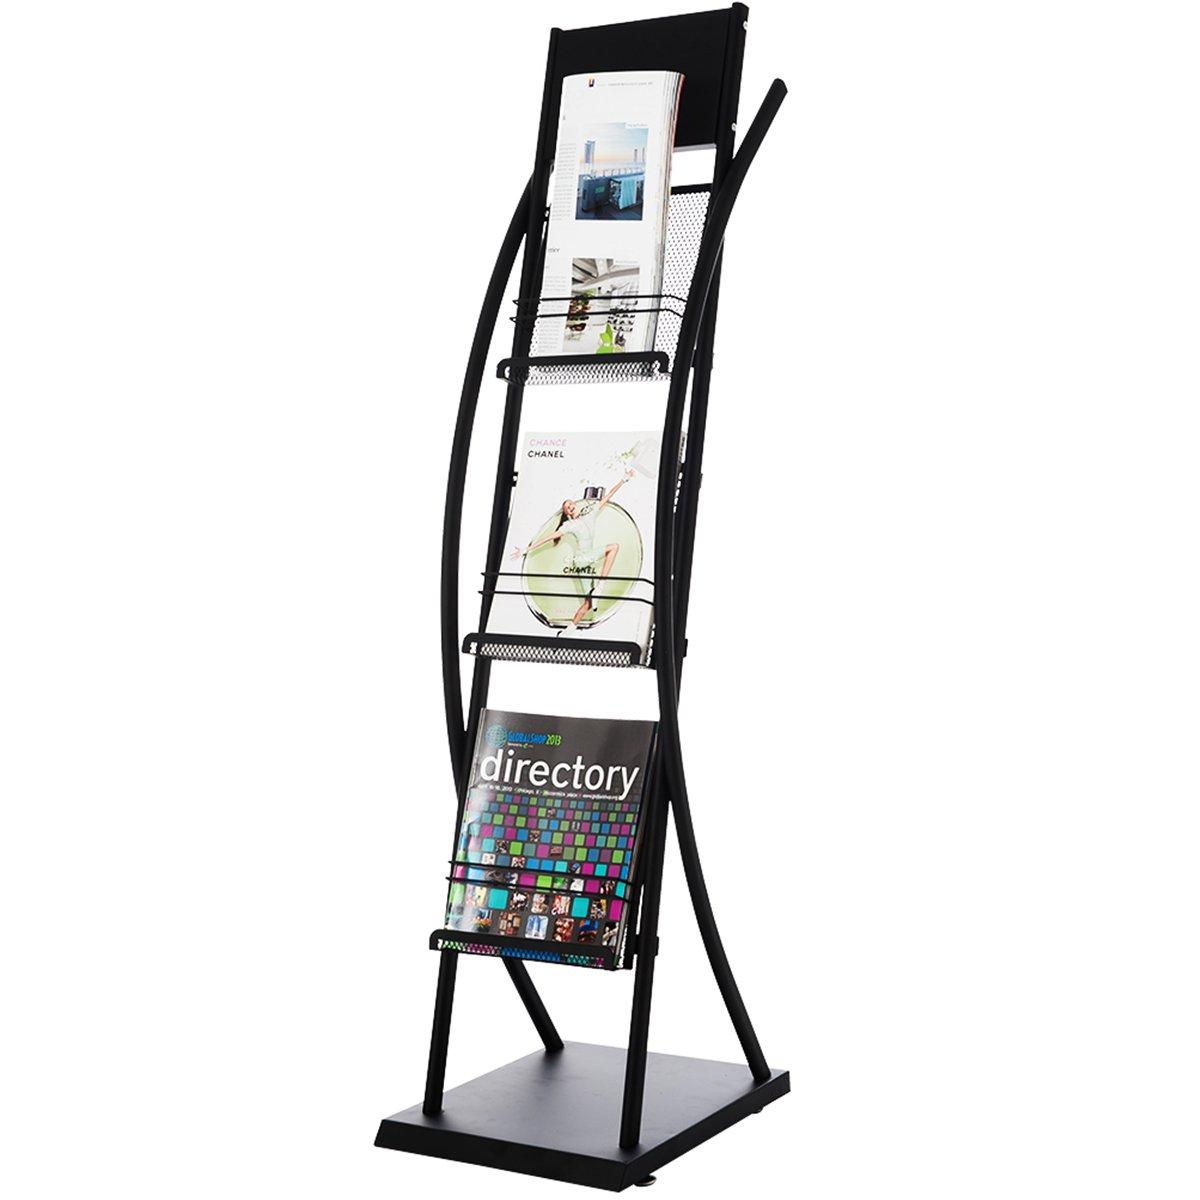 DXP Floor Standing Brochure Holder 3 Shelves Literature Magazine Display Stand Rack HJ-06 DXPHJ-06